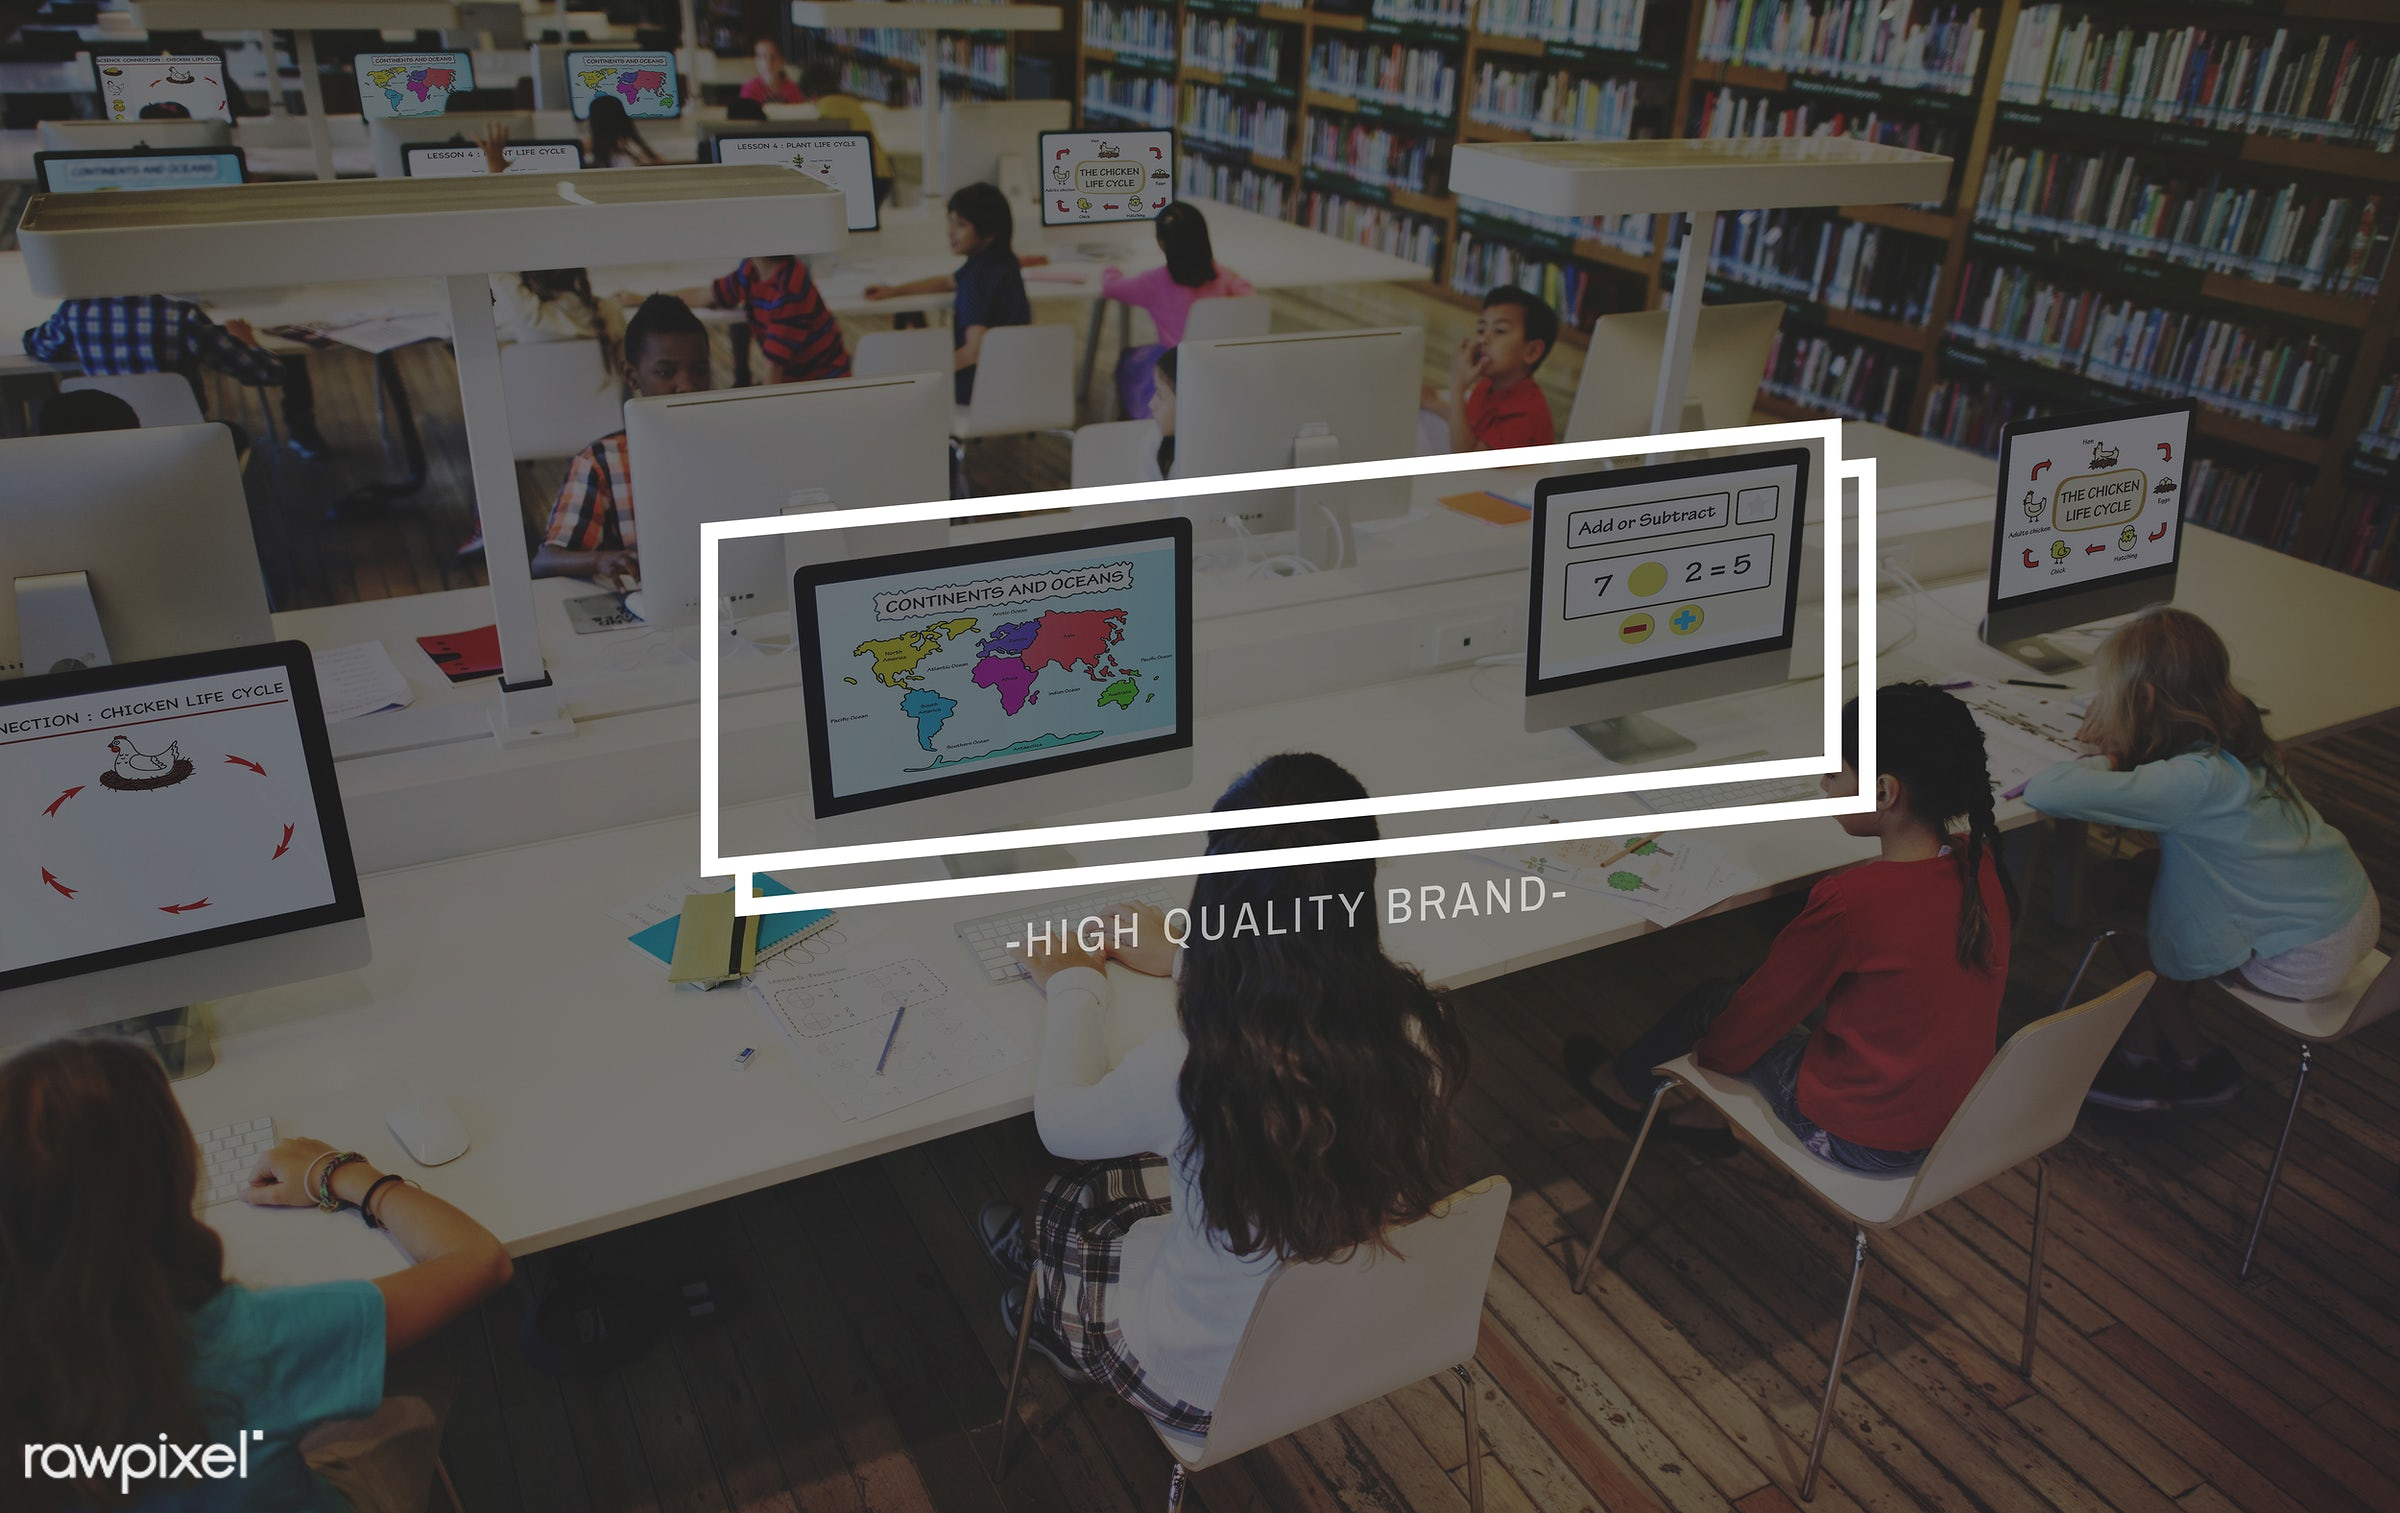 advertising, books, brand, branding, business, childhood, children, classmates, company, computer, contemporary, decoration...